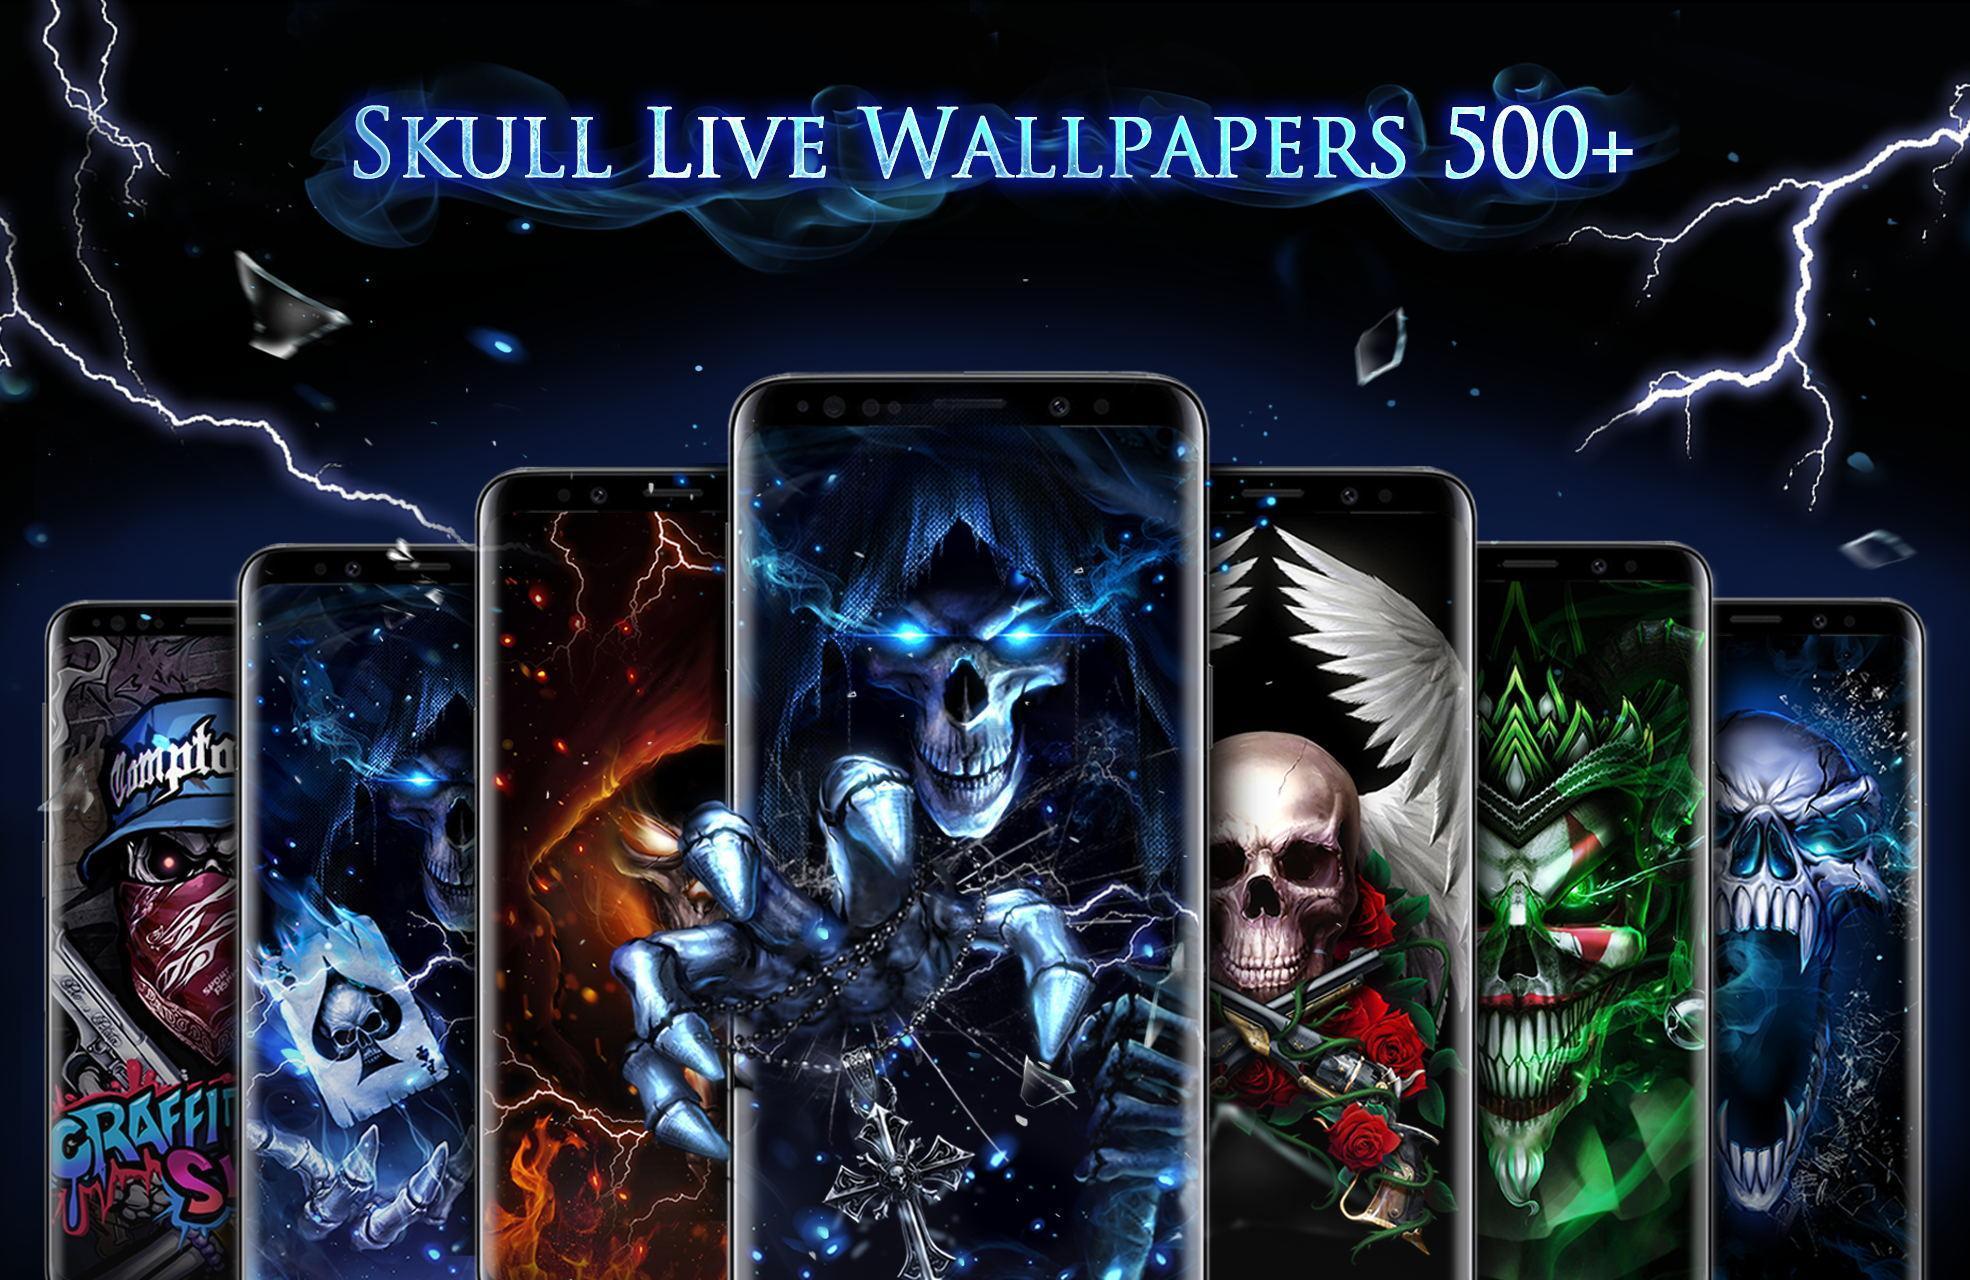 Blue Fire Skull Bone Live Wallpaper For Android Apk Download